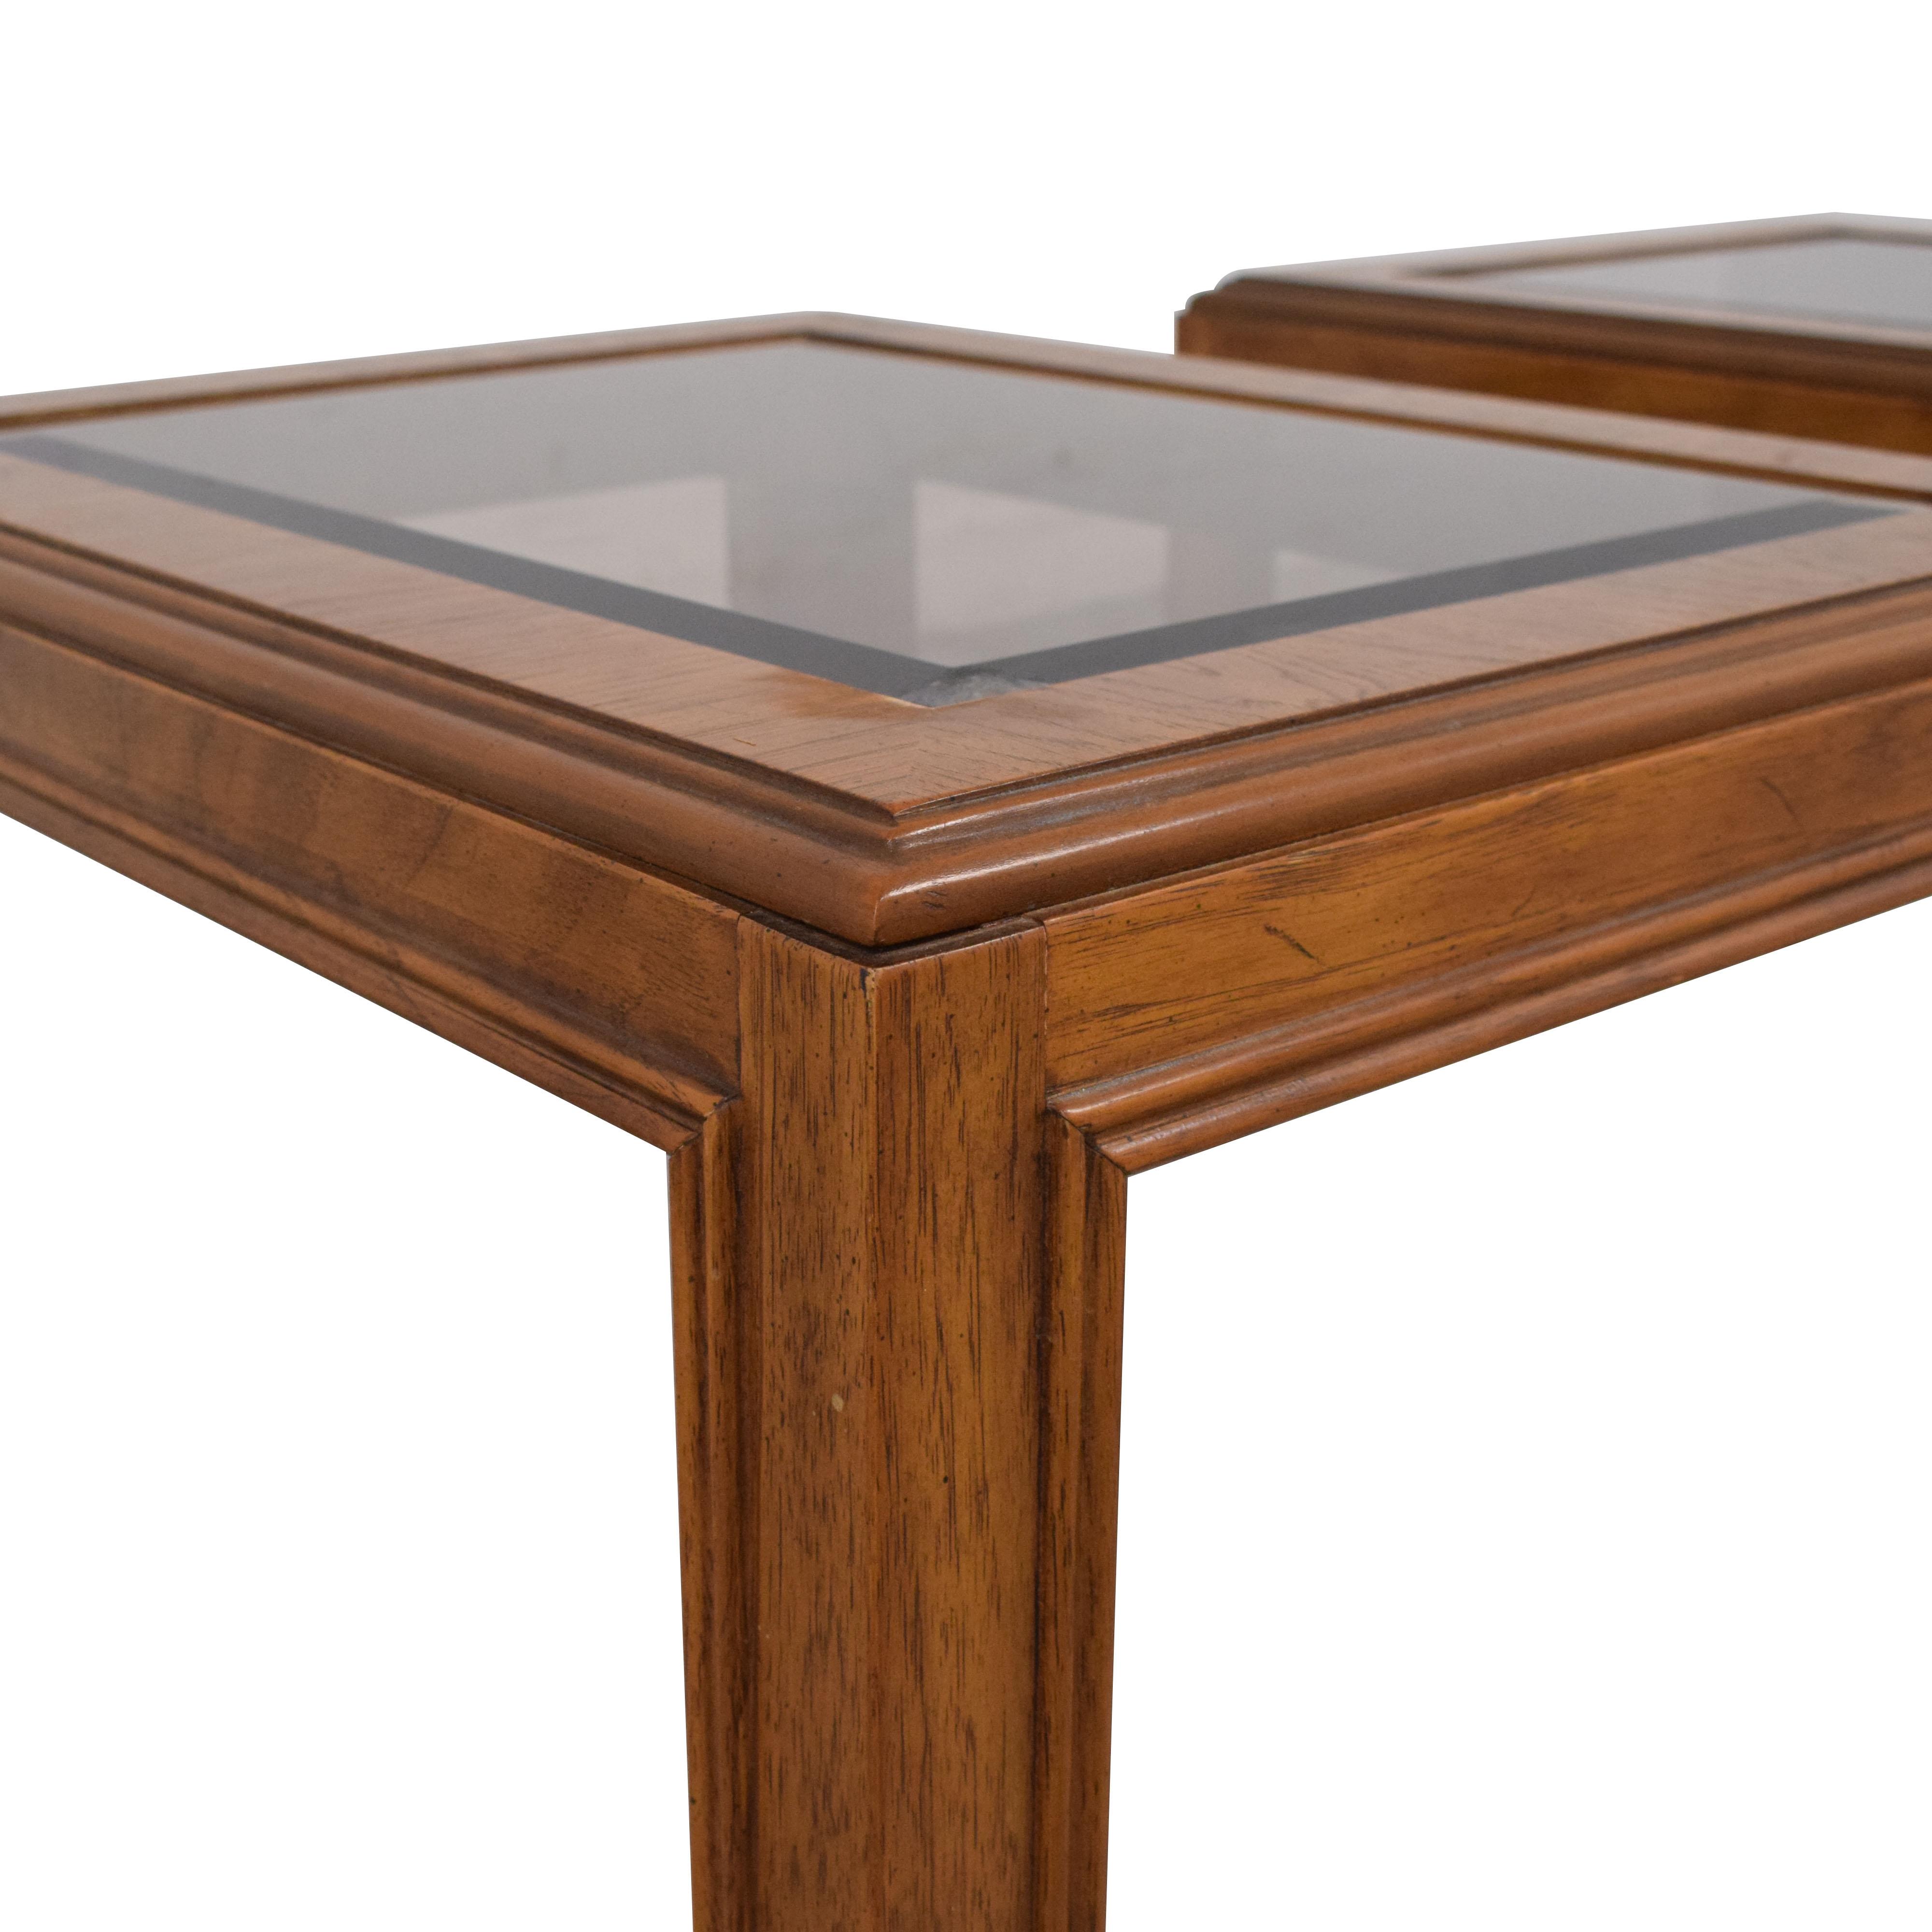 Drexel Heritage Drexel Heritage Mid-Century End Tables